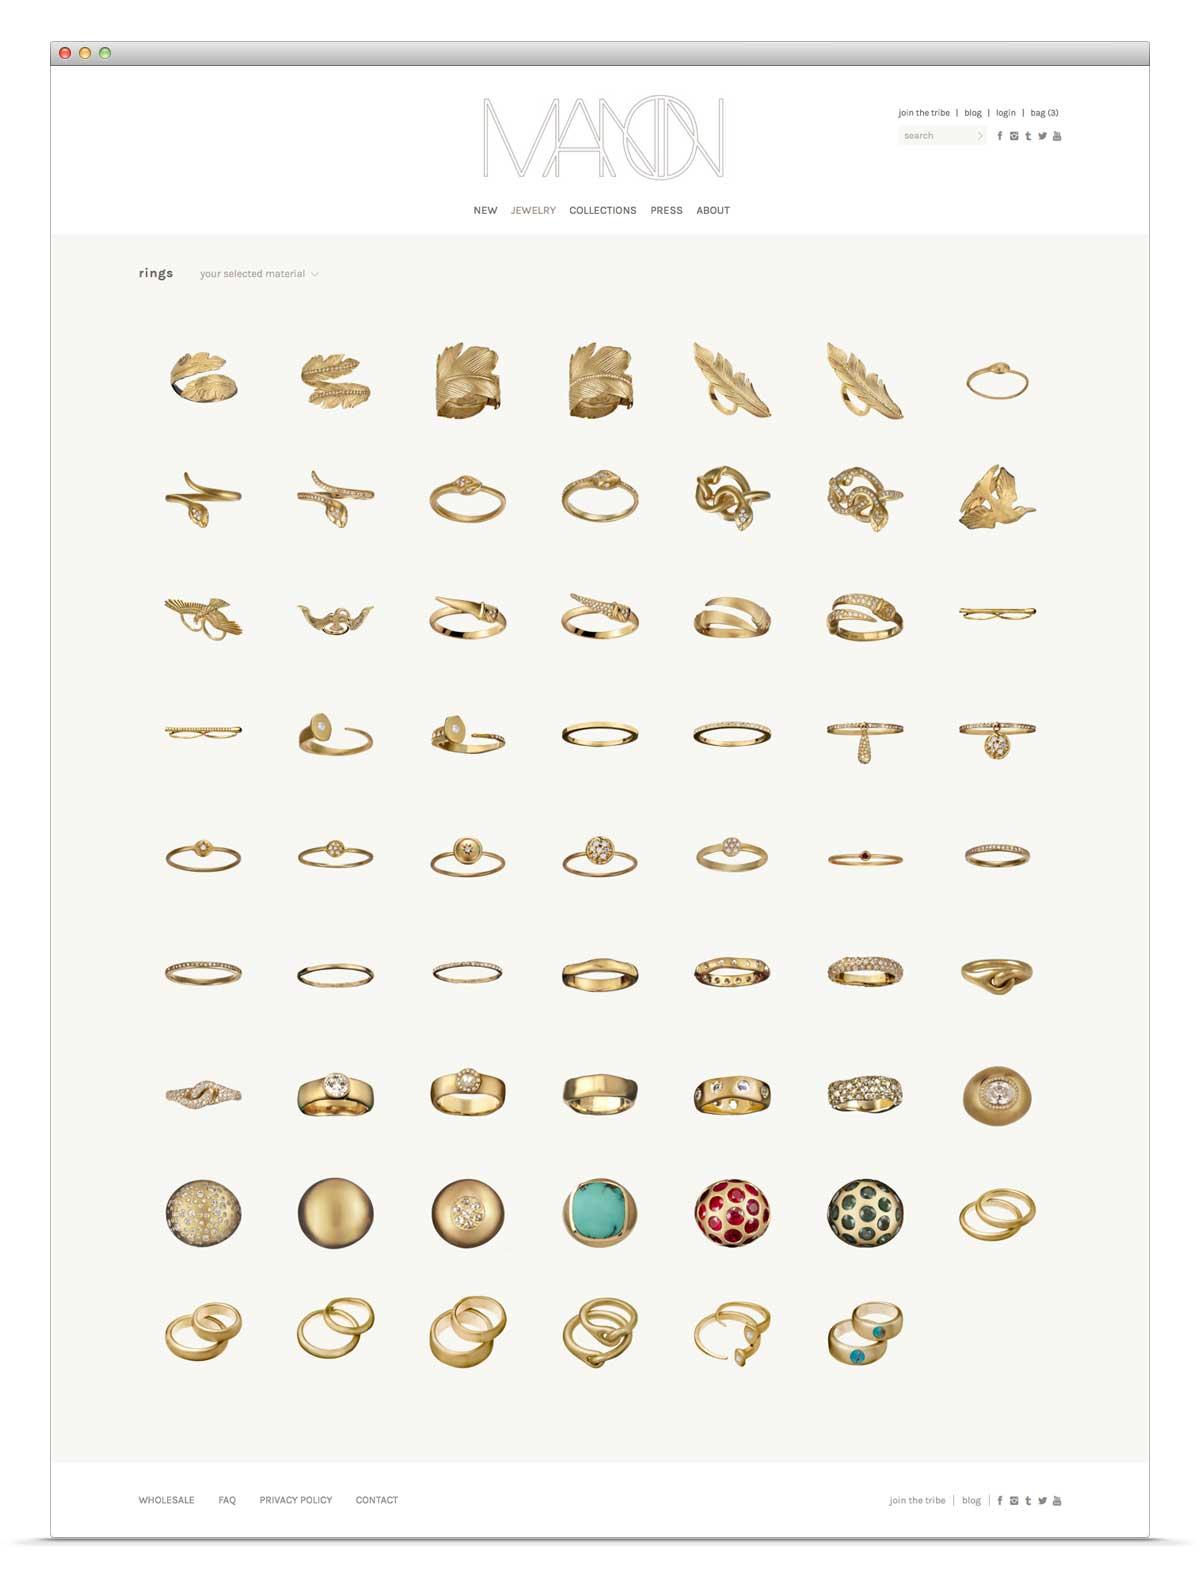 manon-rings-a